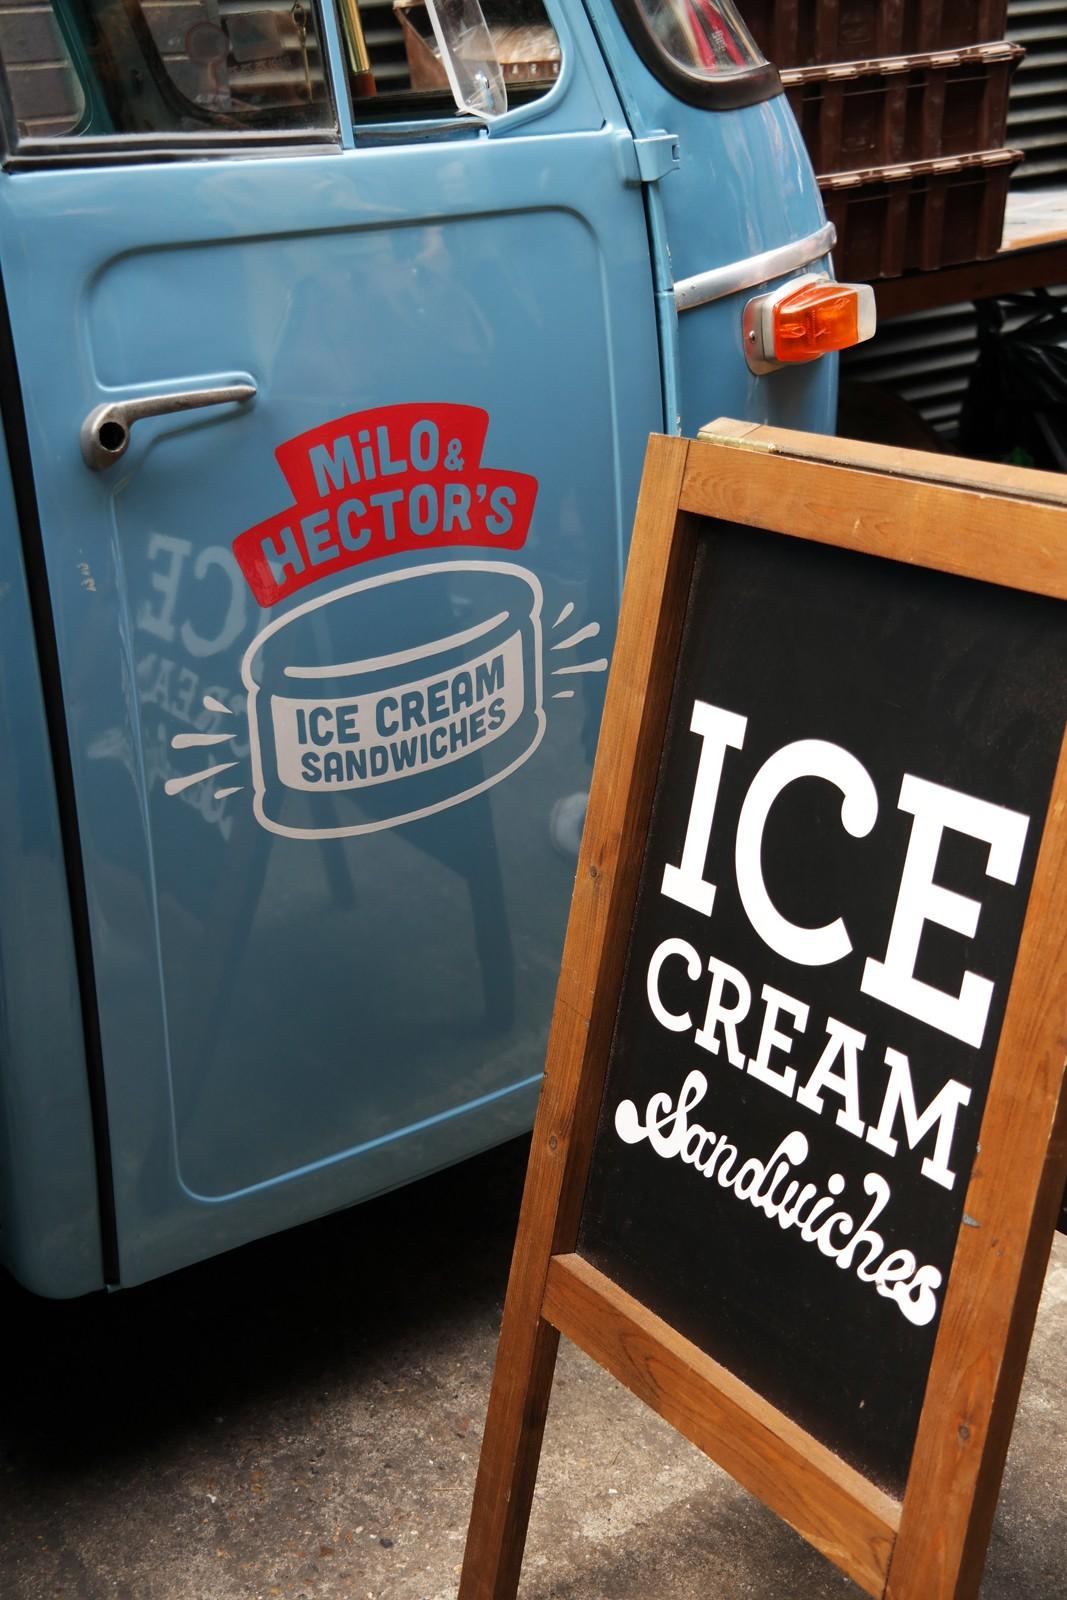 Milo and Hector's Ice Cream sandwich truck Maltby Street Market Ropewalk London Bermondsey street food marché gourmand Londres photo by usofparis